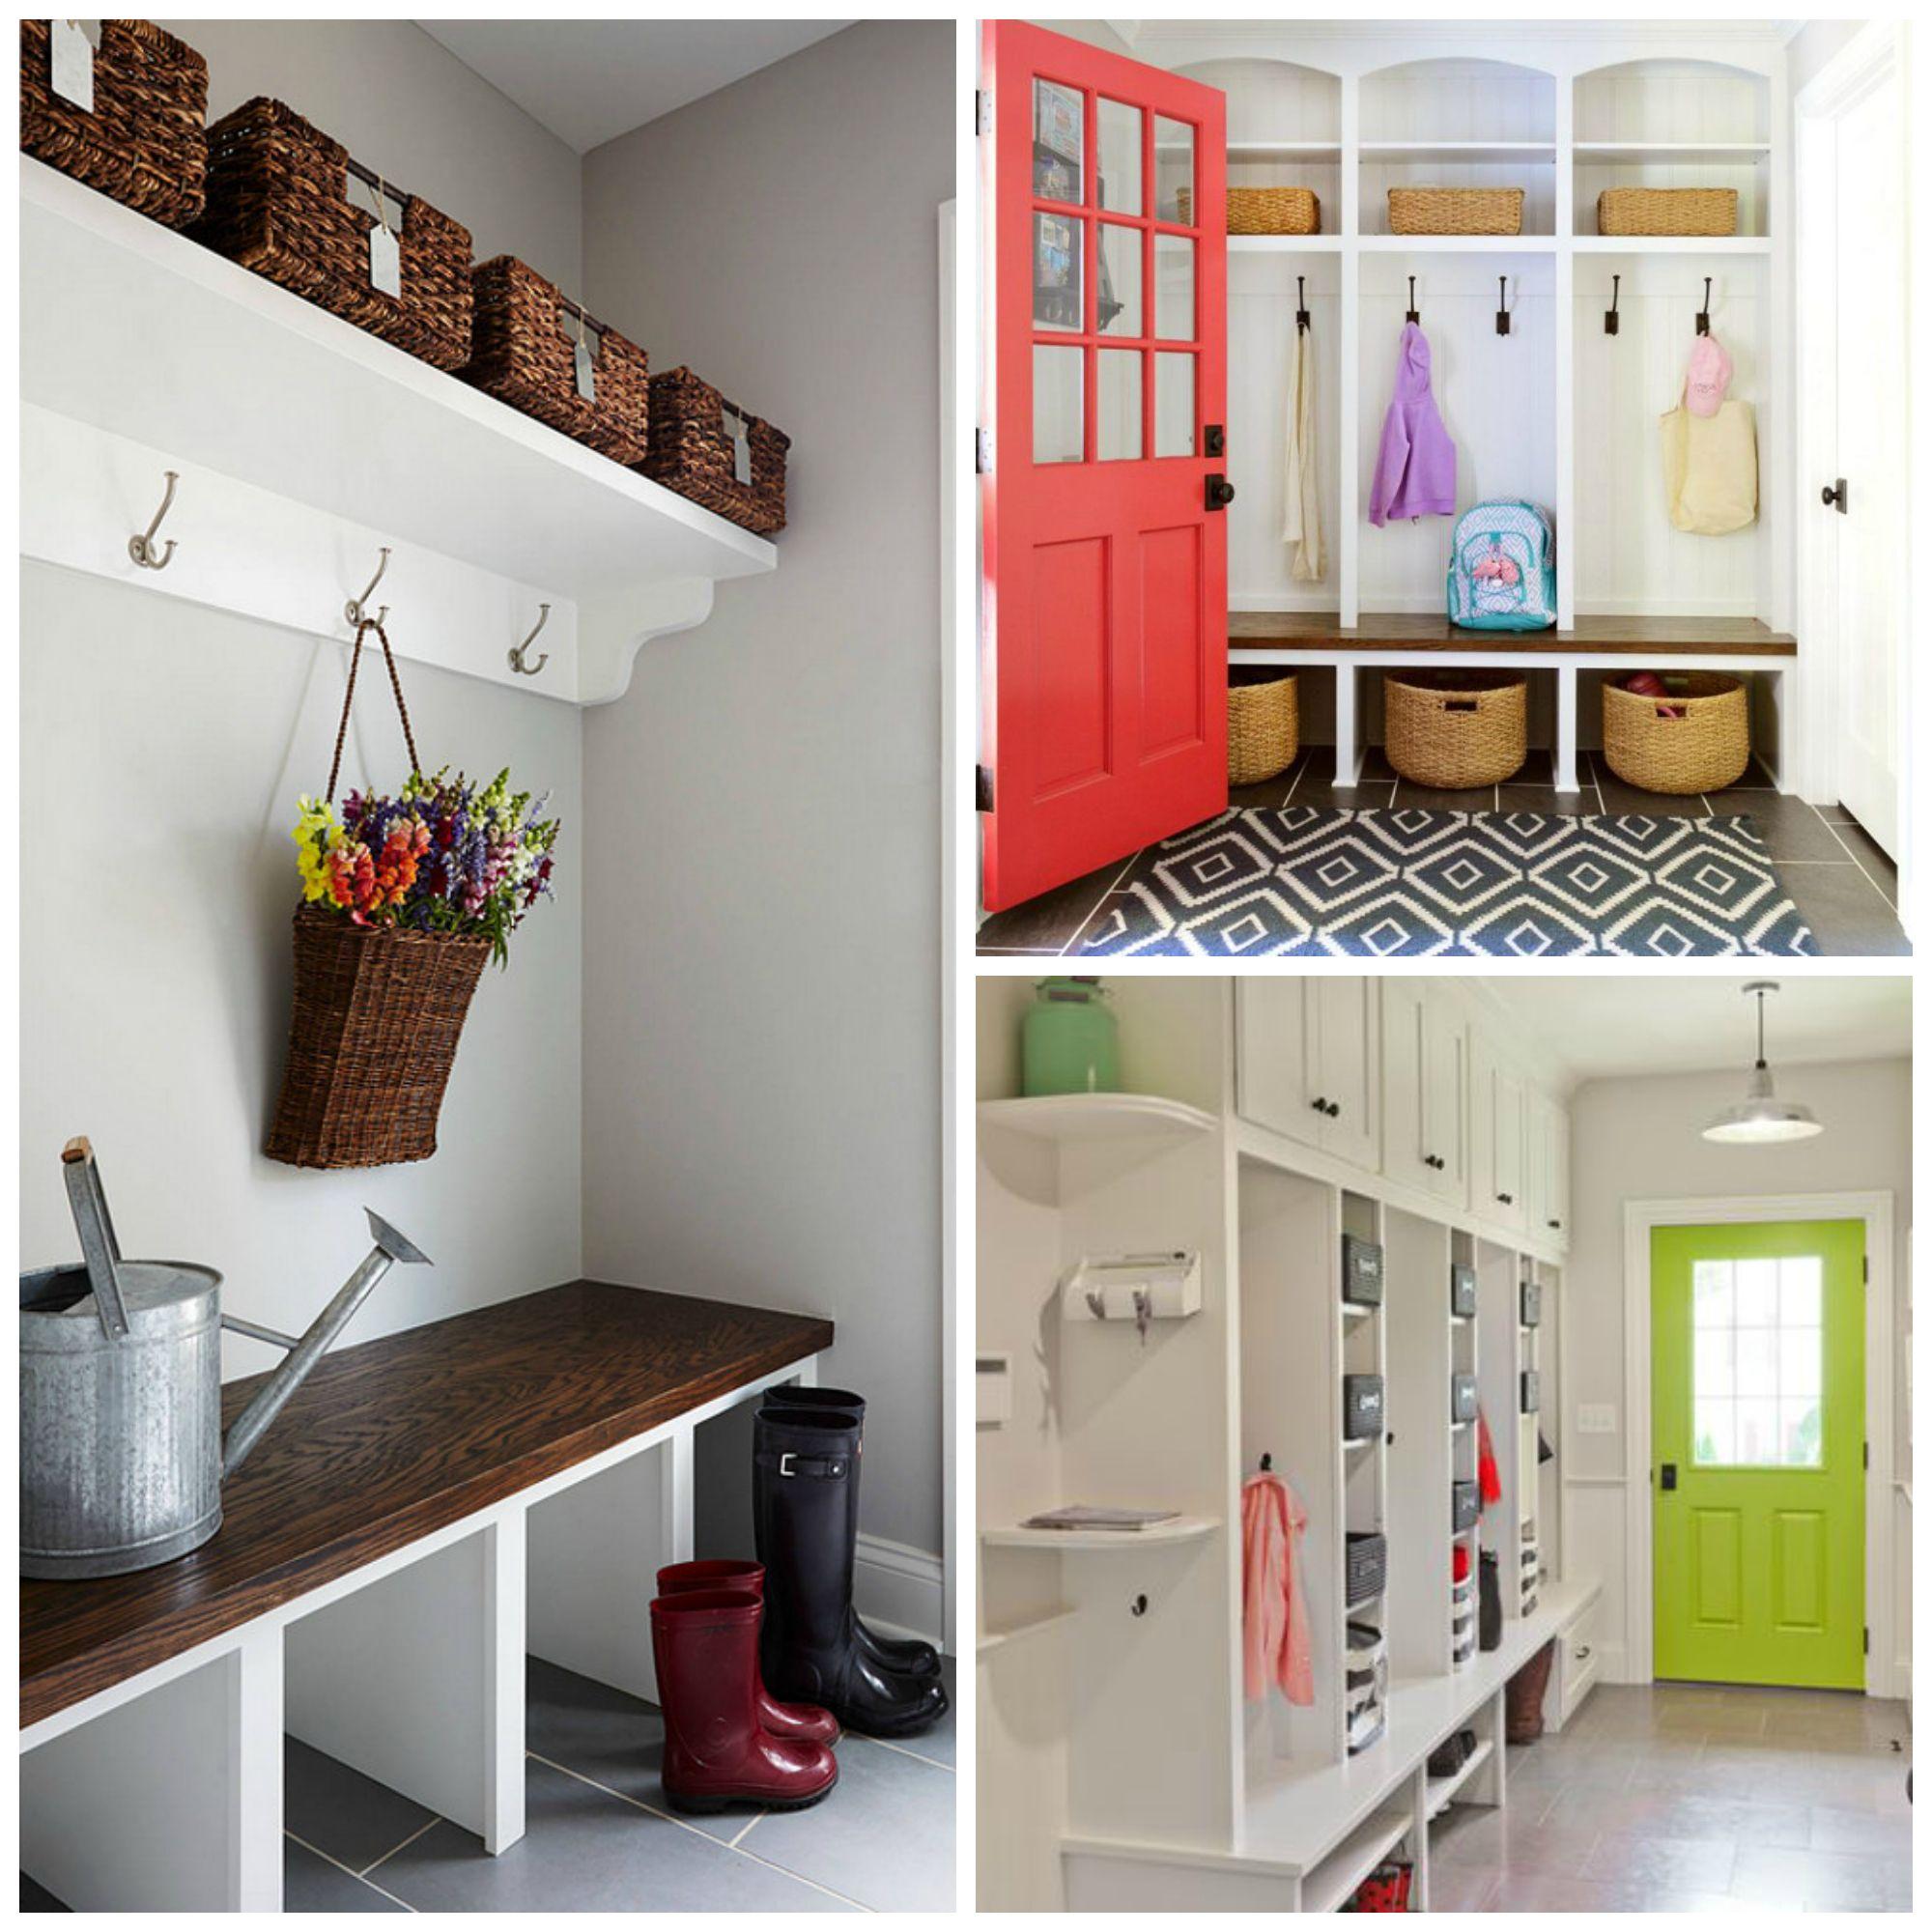 13 Mudroom Ideas To Keep Your Home Mess Free Mudroom Decor Mudroom Design Home